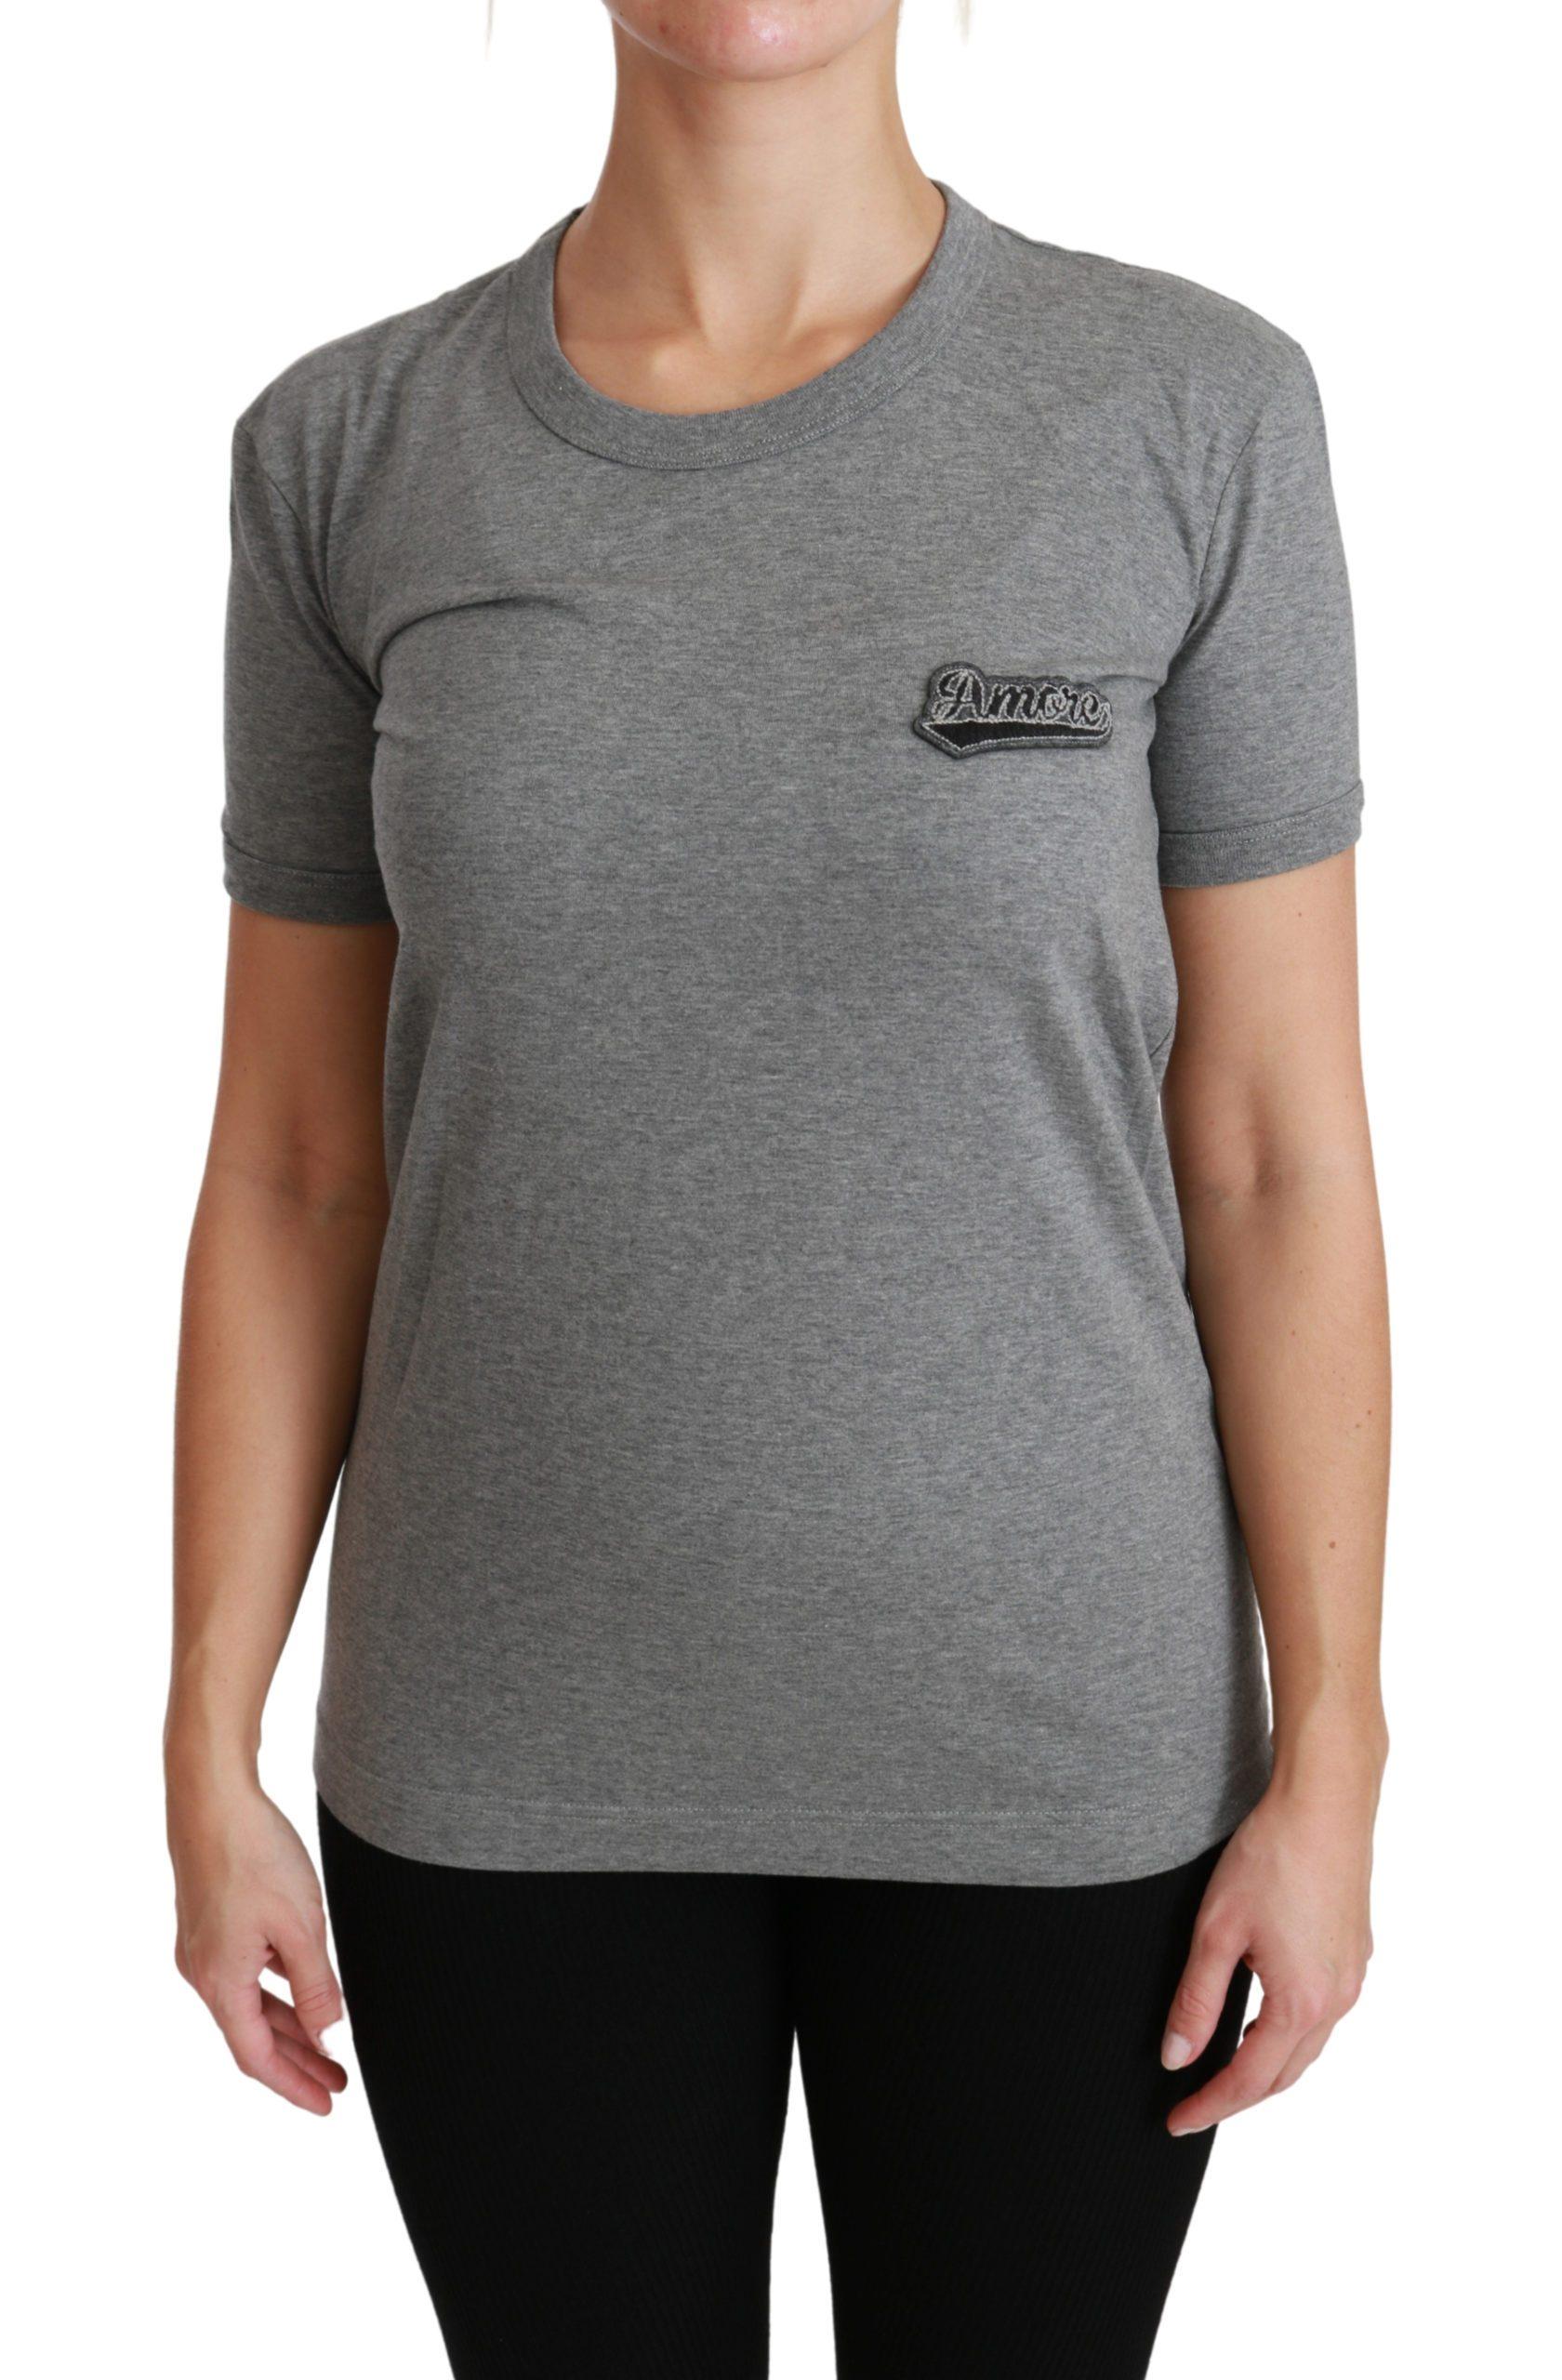 Dolce & Gabbana Women's Crewneck Amore T-Shirt Gray TSH4467 - IT36 | XS